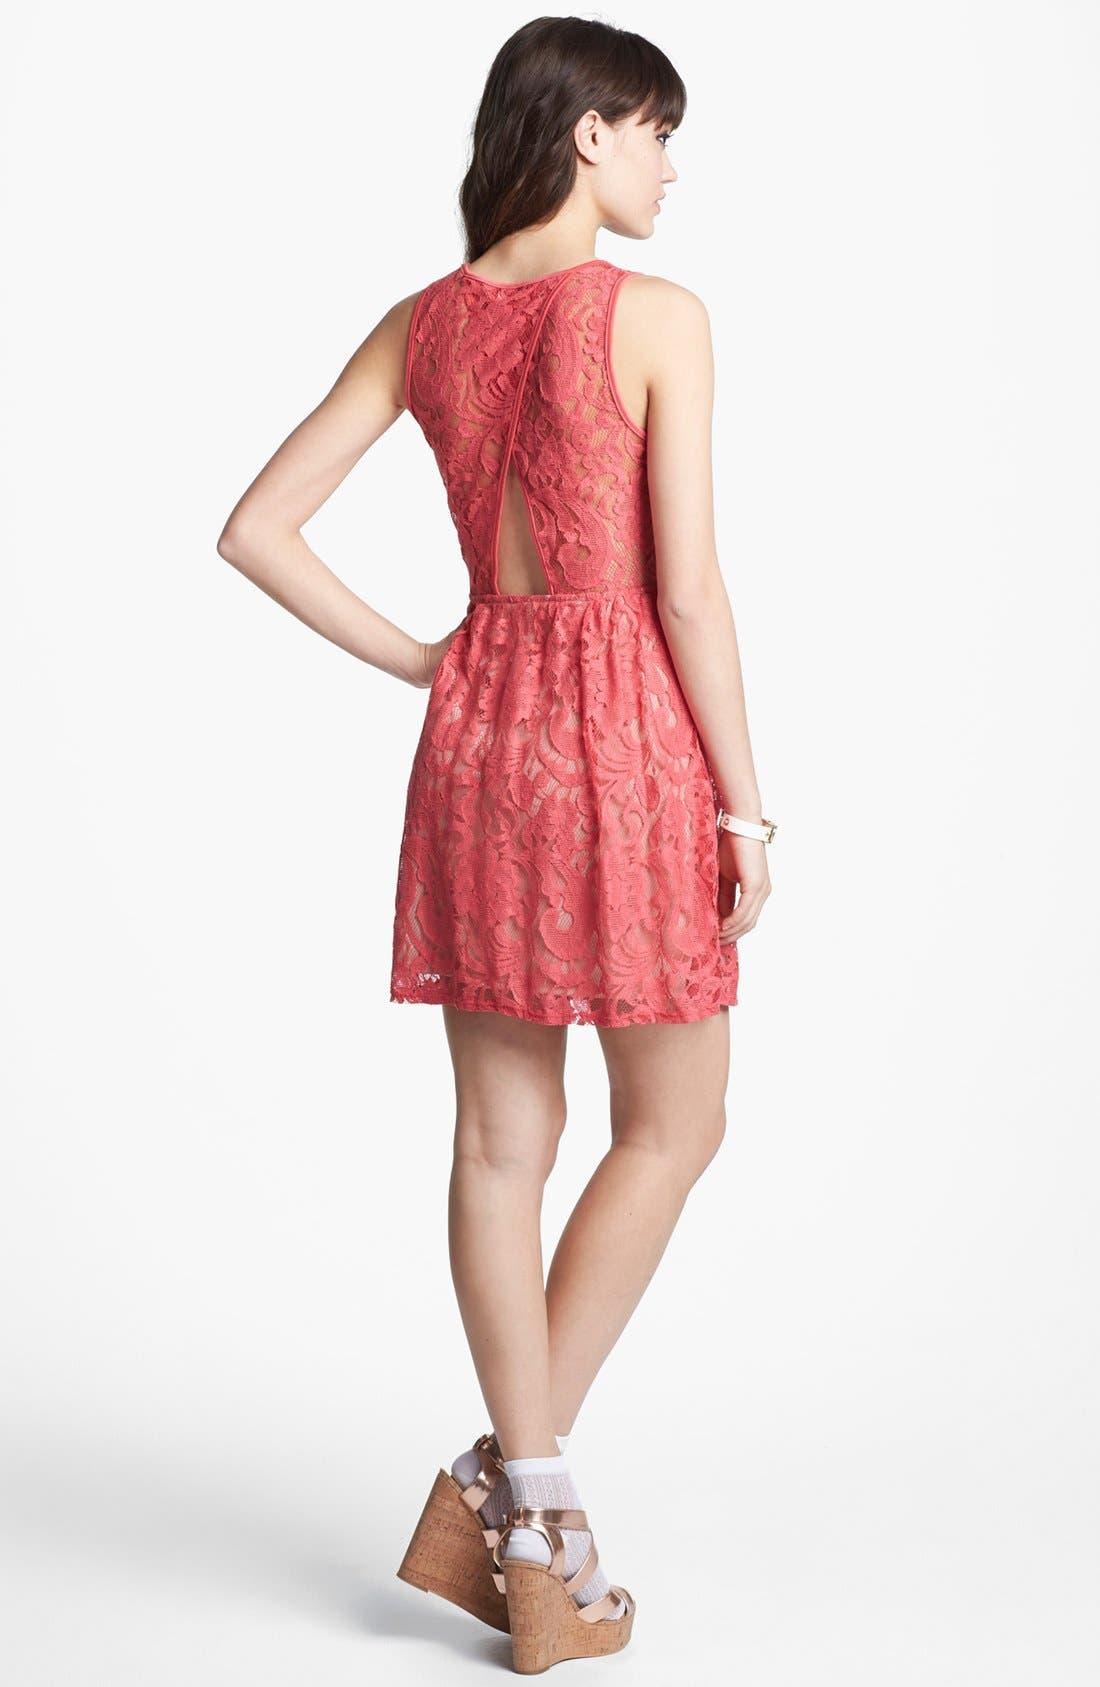 Alternate Image 1 Selected - Fire Back Cutout Lace Skater Dress (Juniors)